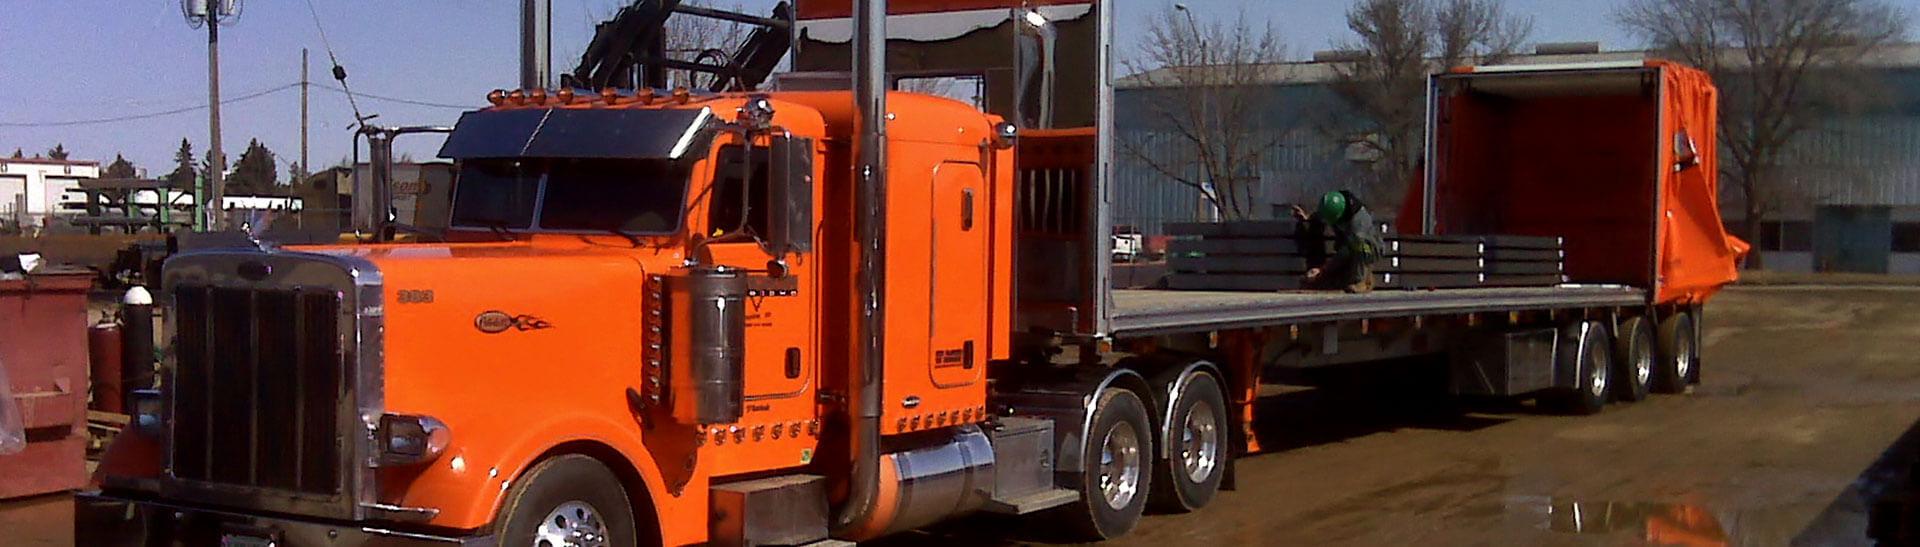 Saskatoon Trucking Services, Long Haul Trucking and Transportation Logistics